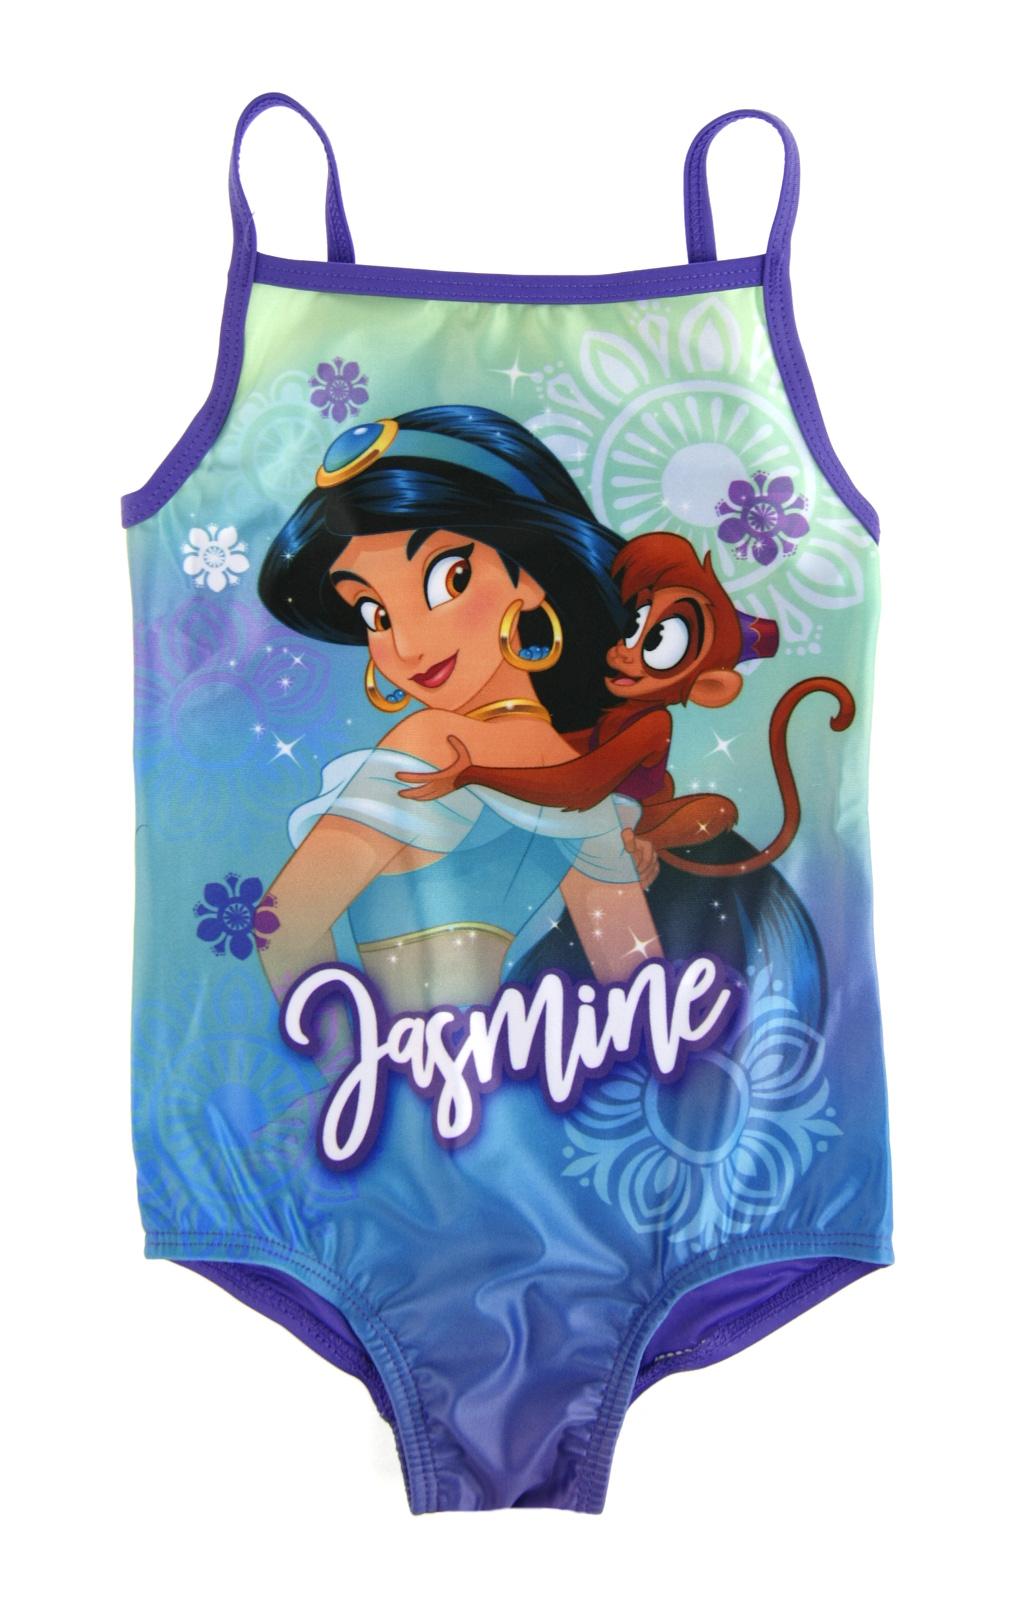 481a0a8e7ba6 Girls Disney Character Swimming Costume Swim Suit Beach Summer ...